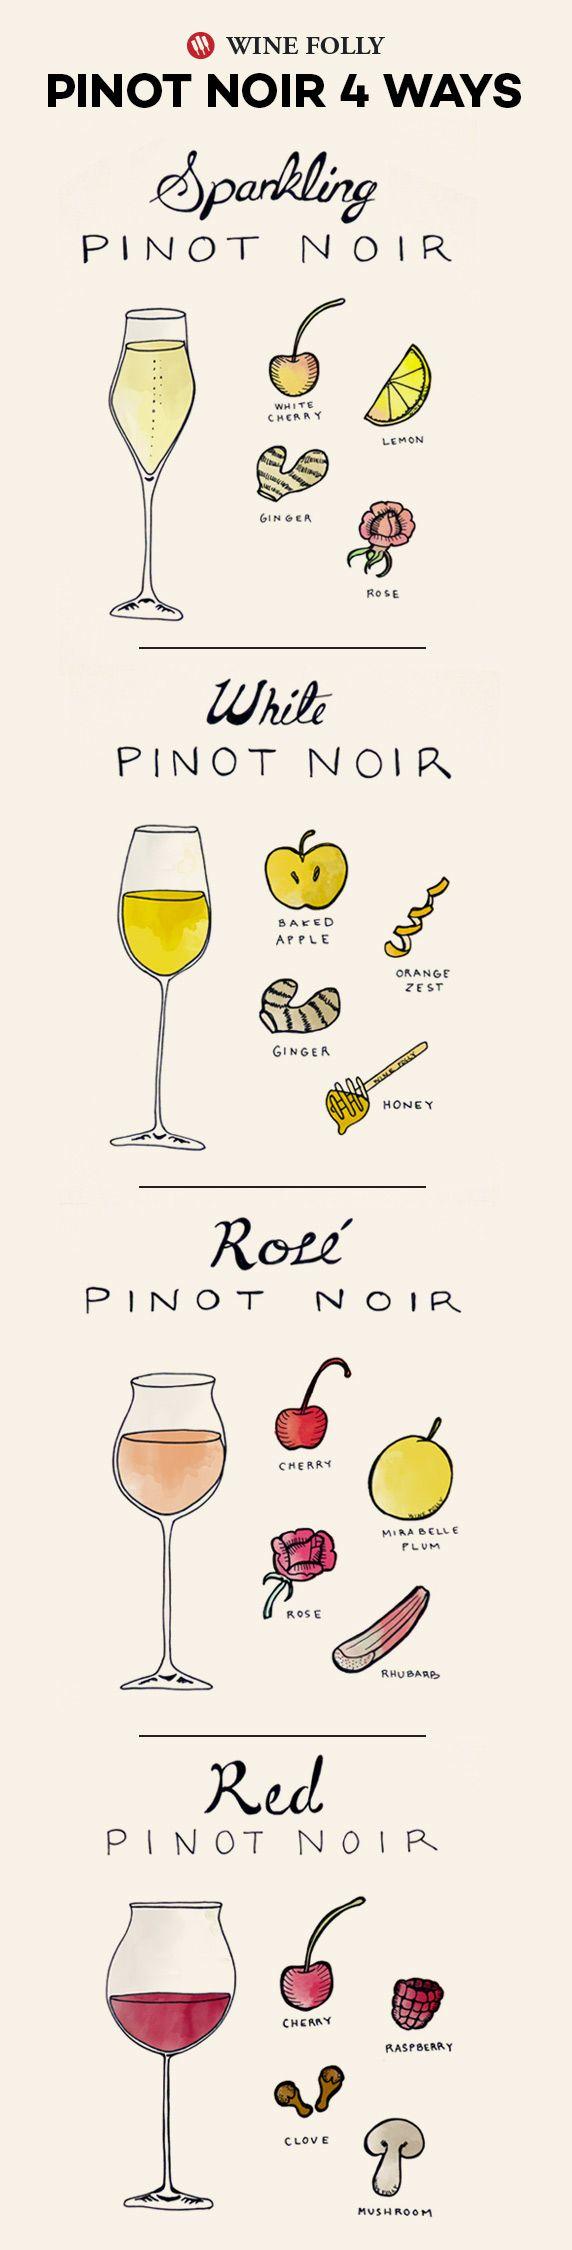 Pinot Noir 4 Ways